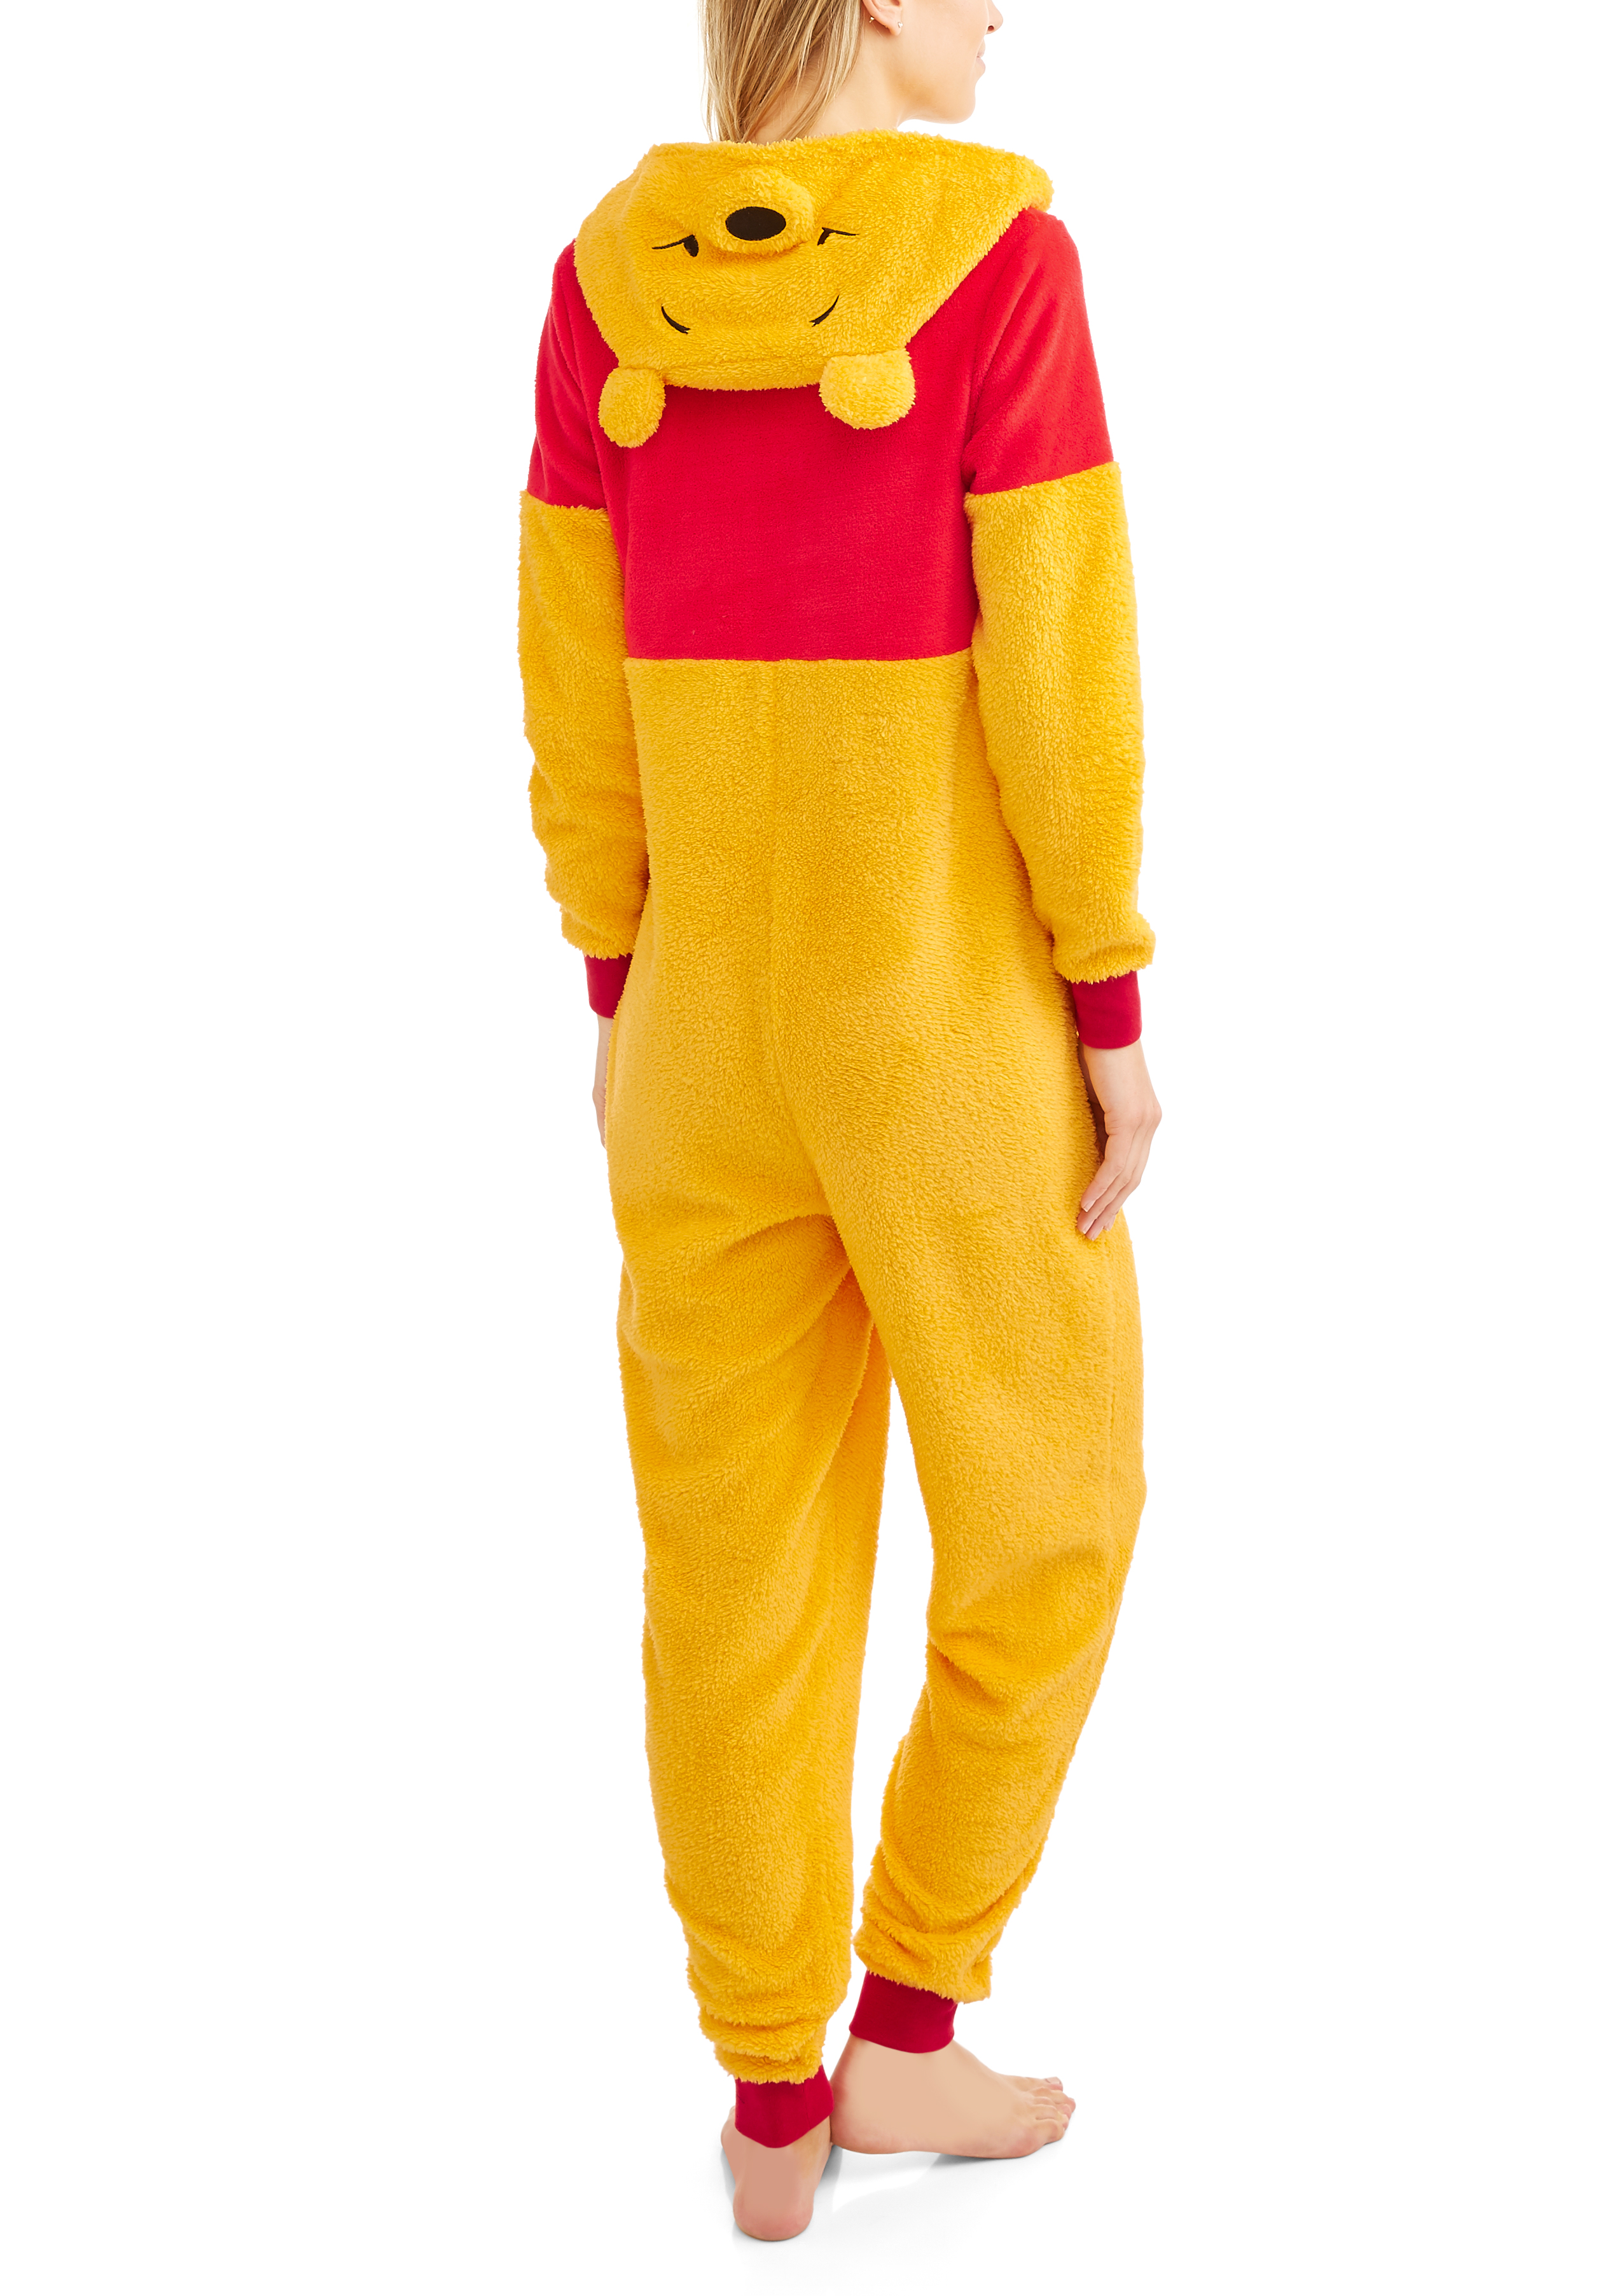 License - Winnie the pooh women s and women s plus sleepwear adult costume  union suit pajama (sizes xs-3x) - Walmart.com 8aac3718e8